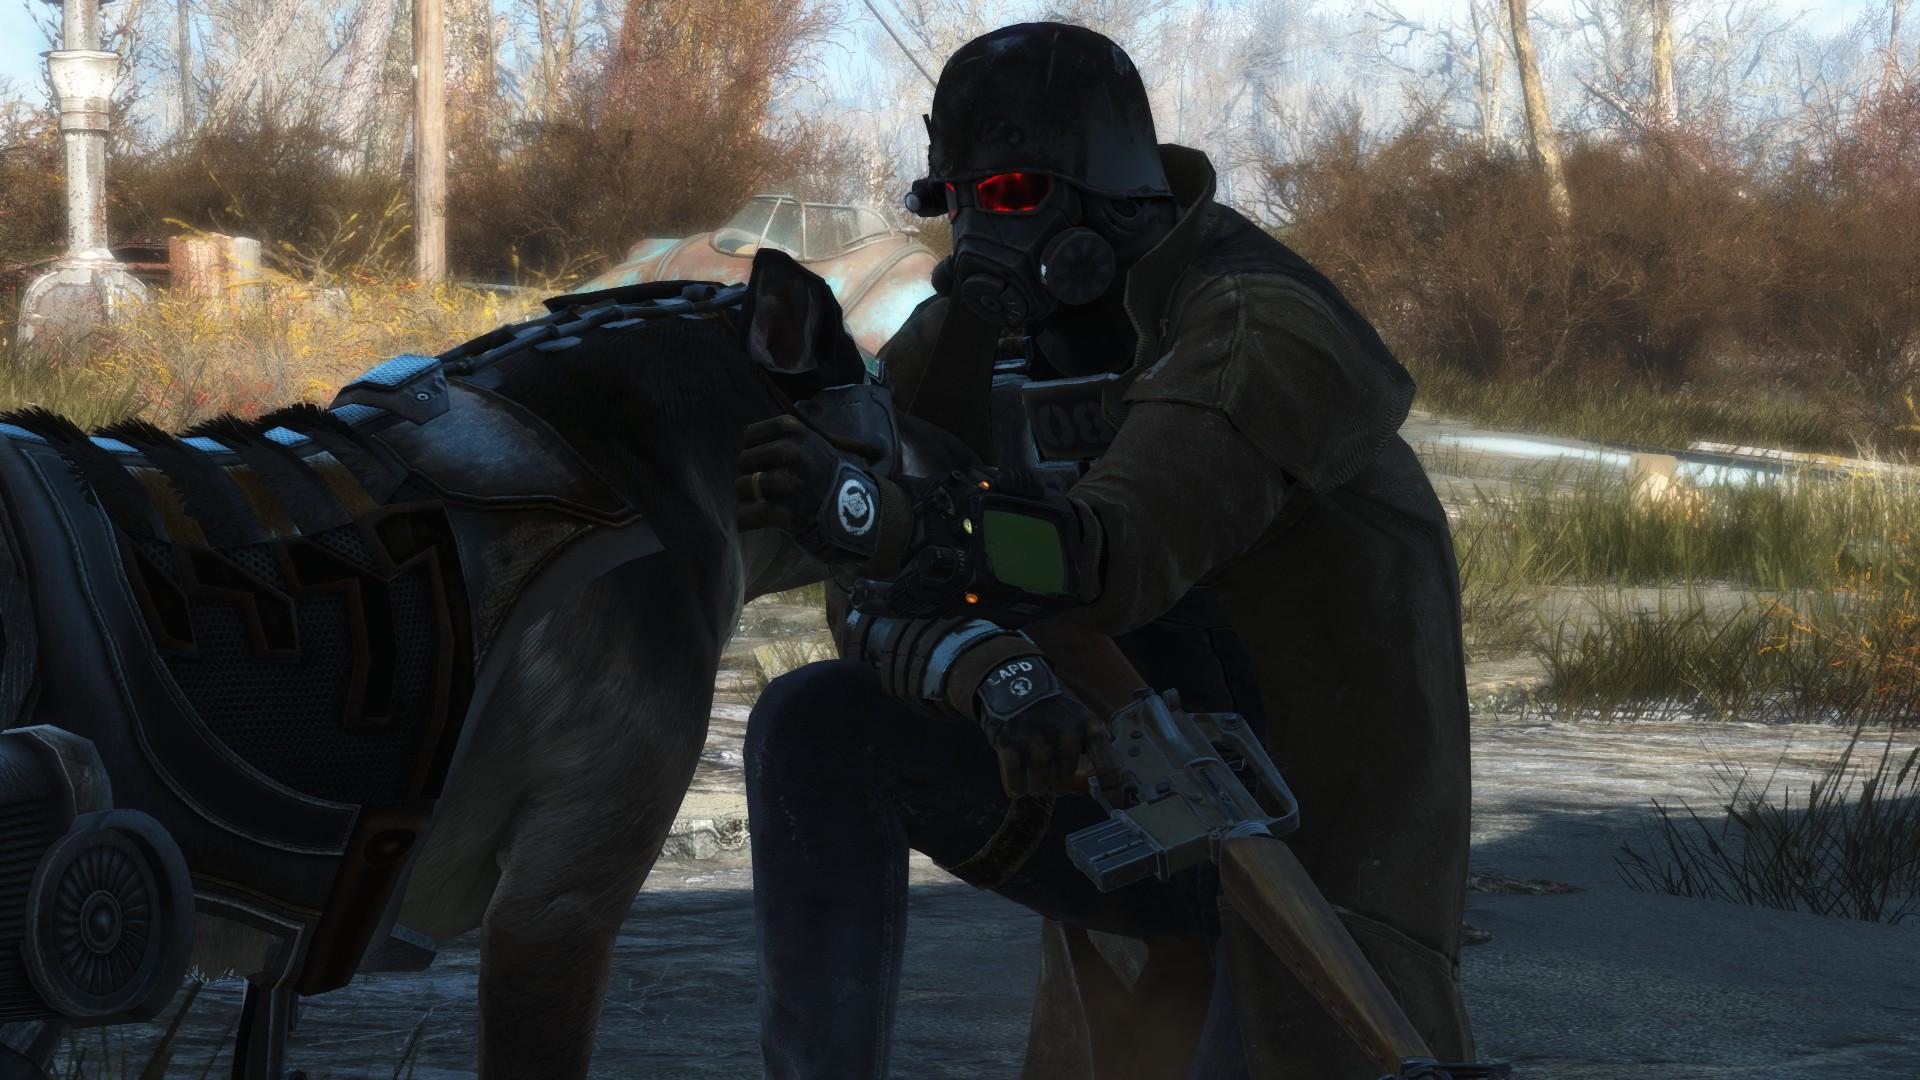 Fallout 4 NCR Veteran Ranger Mod Packs Fallout: New Vegas